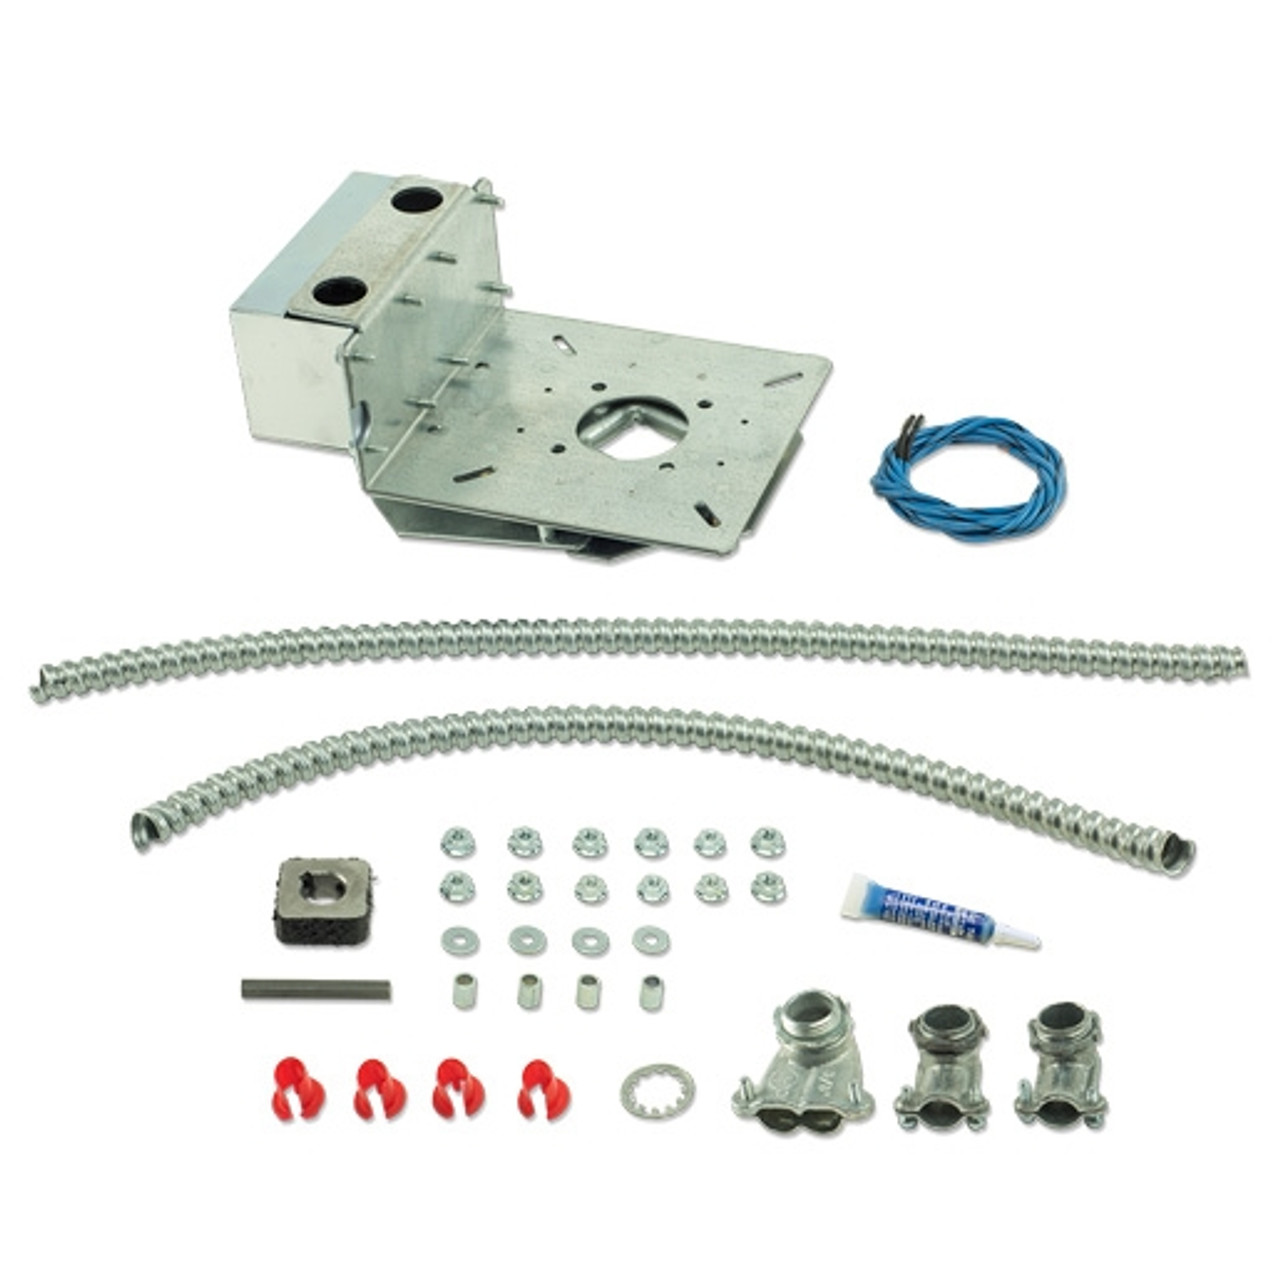 K1 71-B240 Brake Kit, 230-460V w/Solenoid